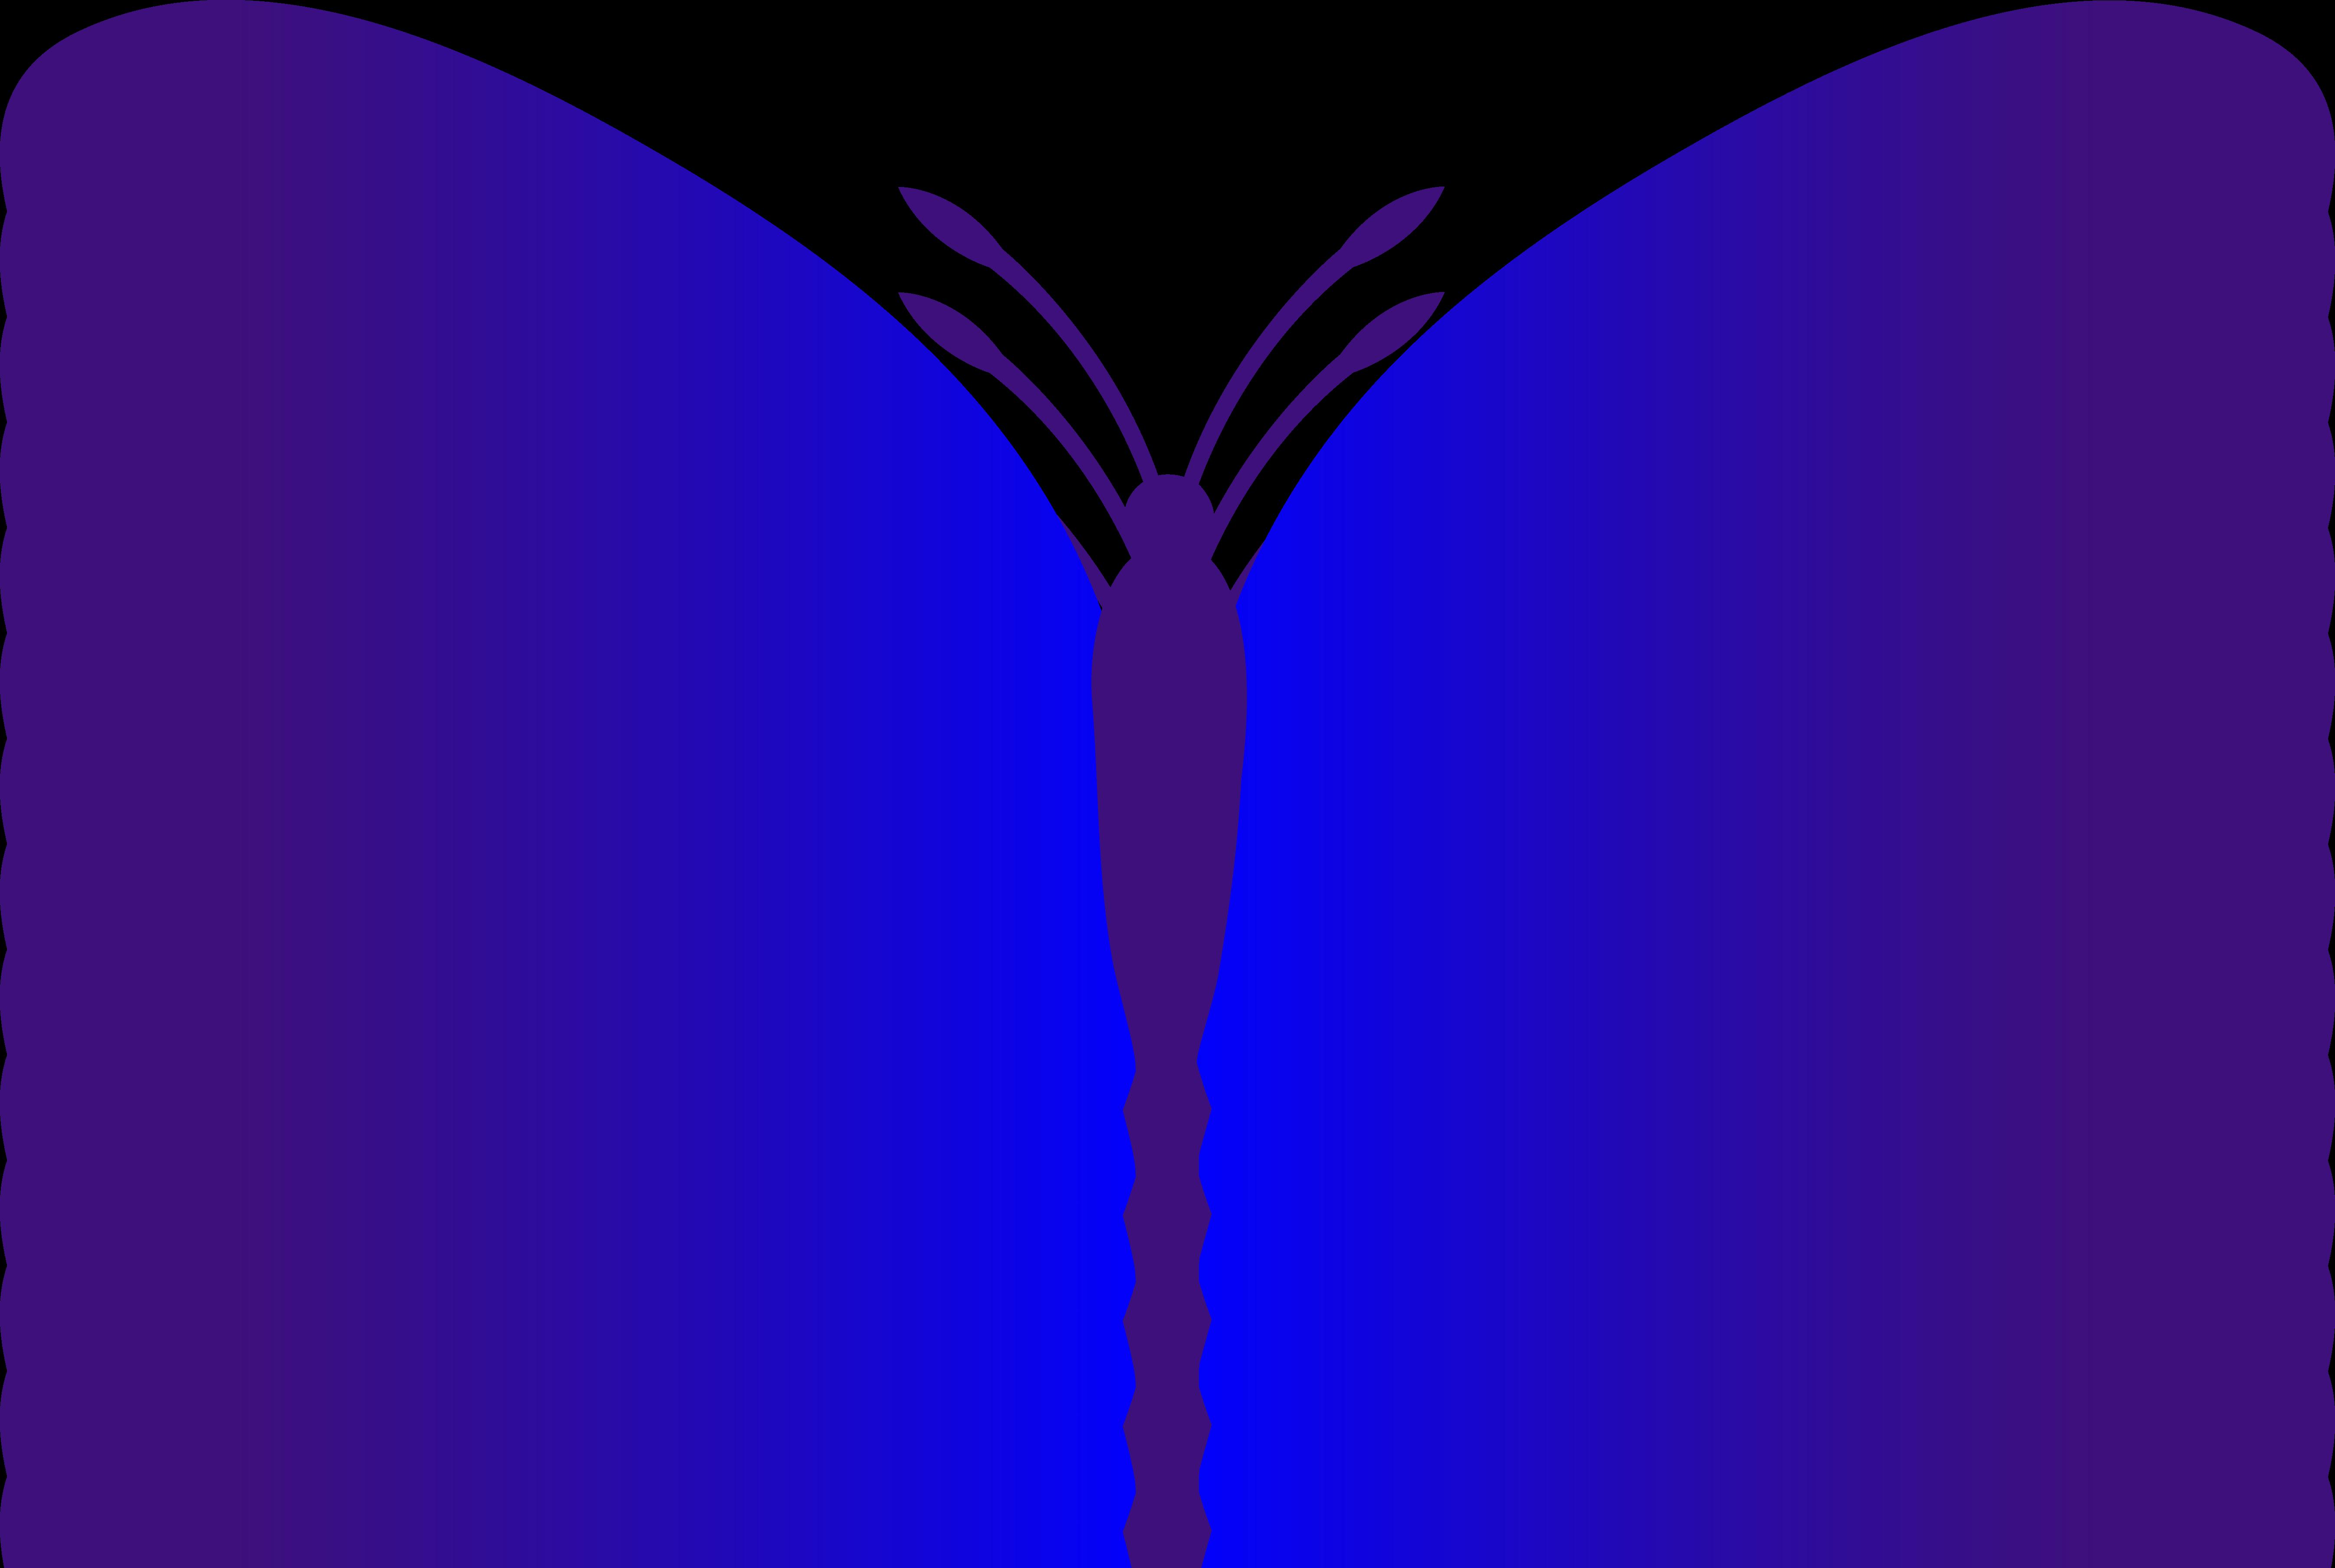 5381x3614 Simple Blue Butterfly